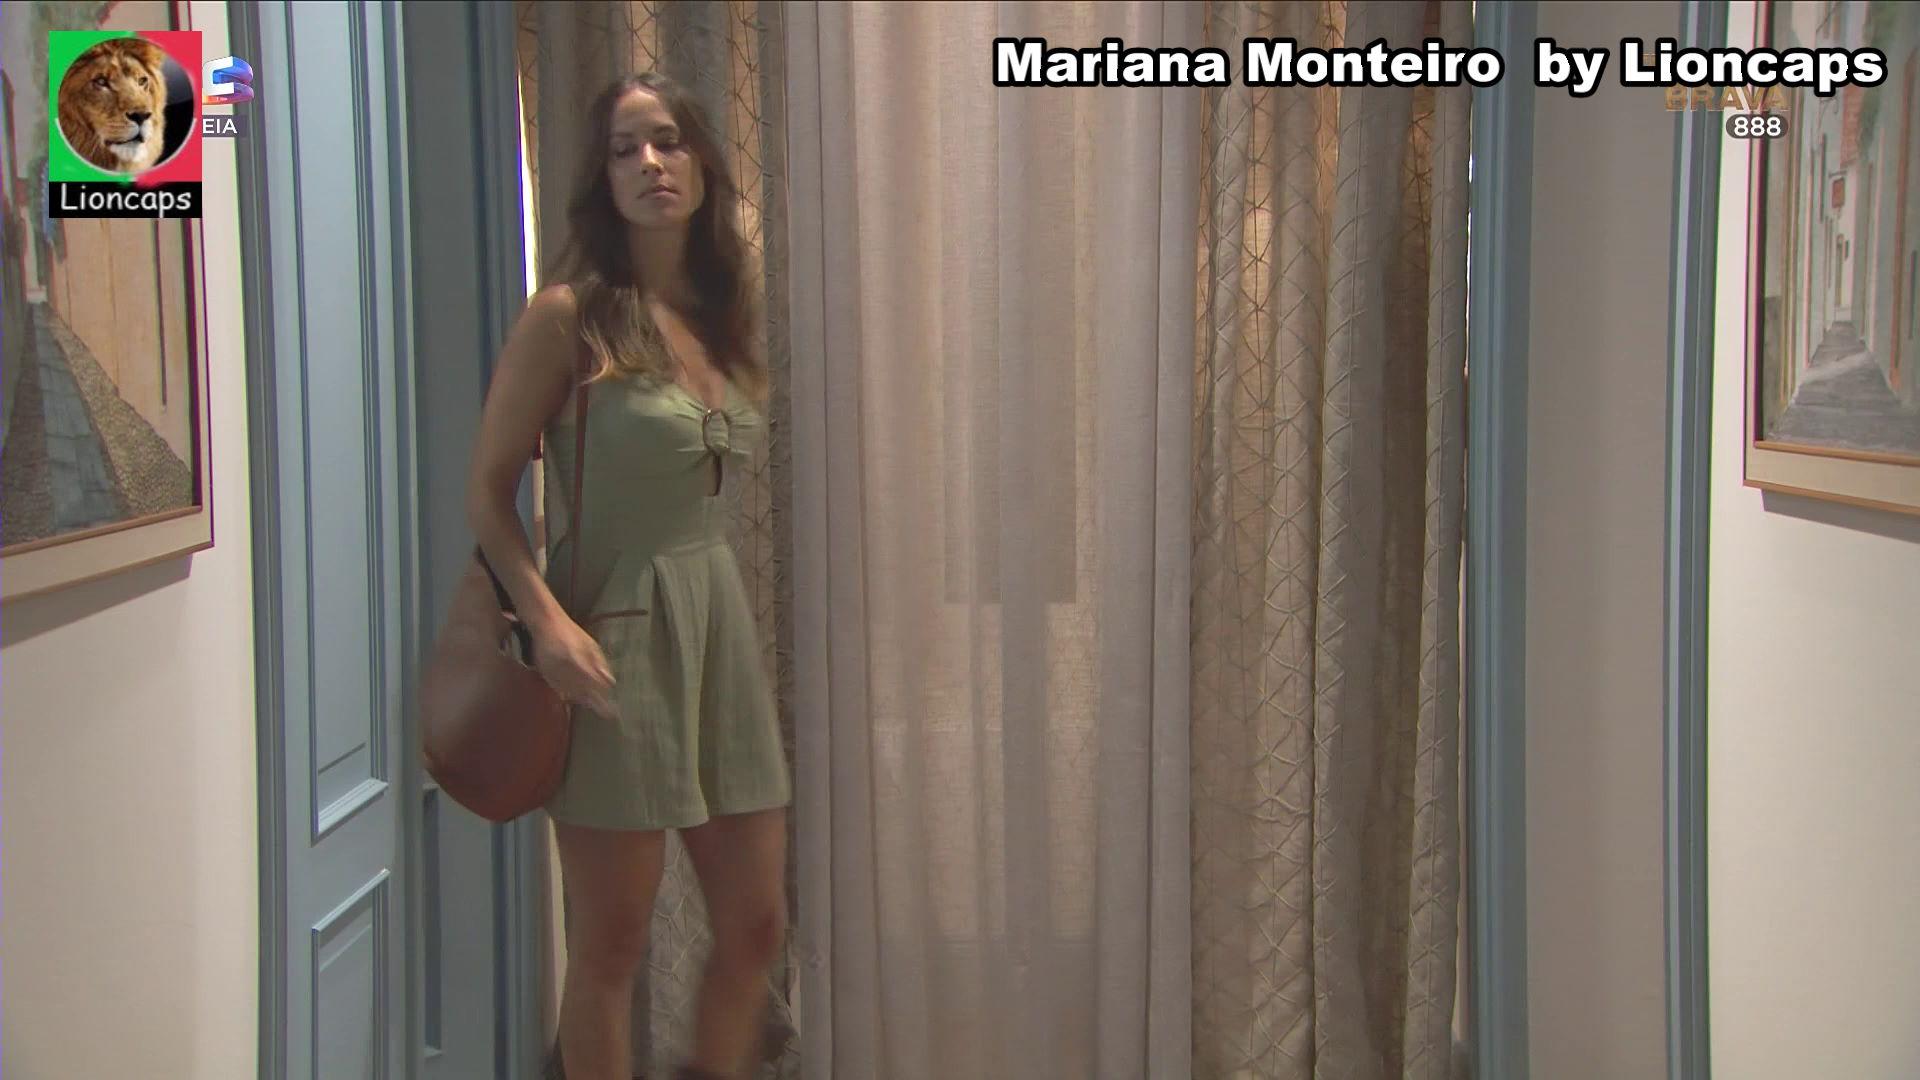 634929714_mariana_monteiro_vs191124_2711_122_355lo.JPG